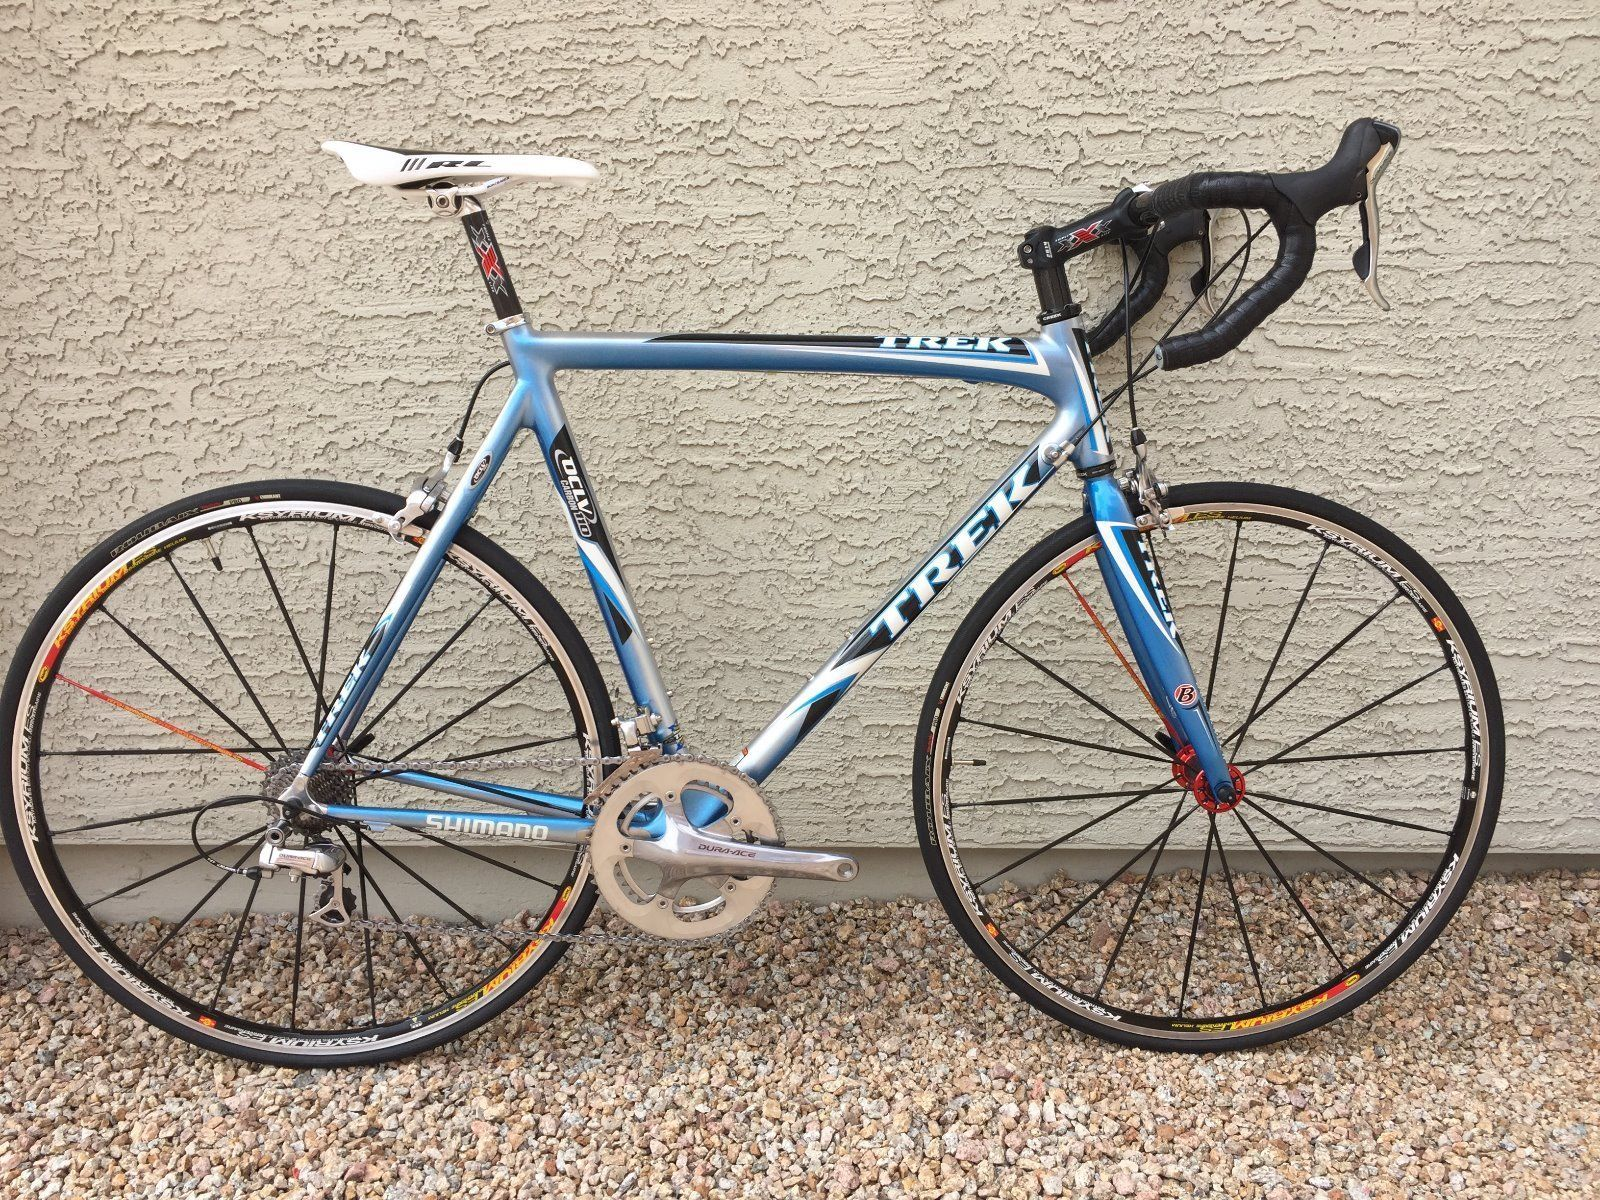 Trek Madone 5.9 SL OCLV Carbon 110 Dura Ace Road Bike size 60cm ...